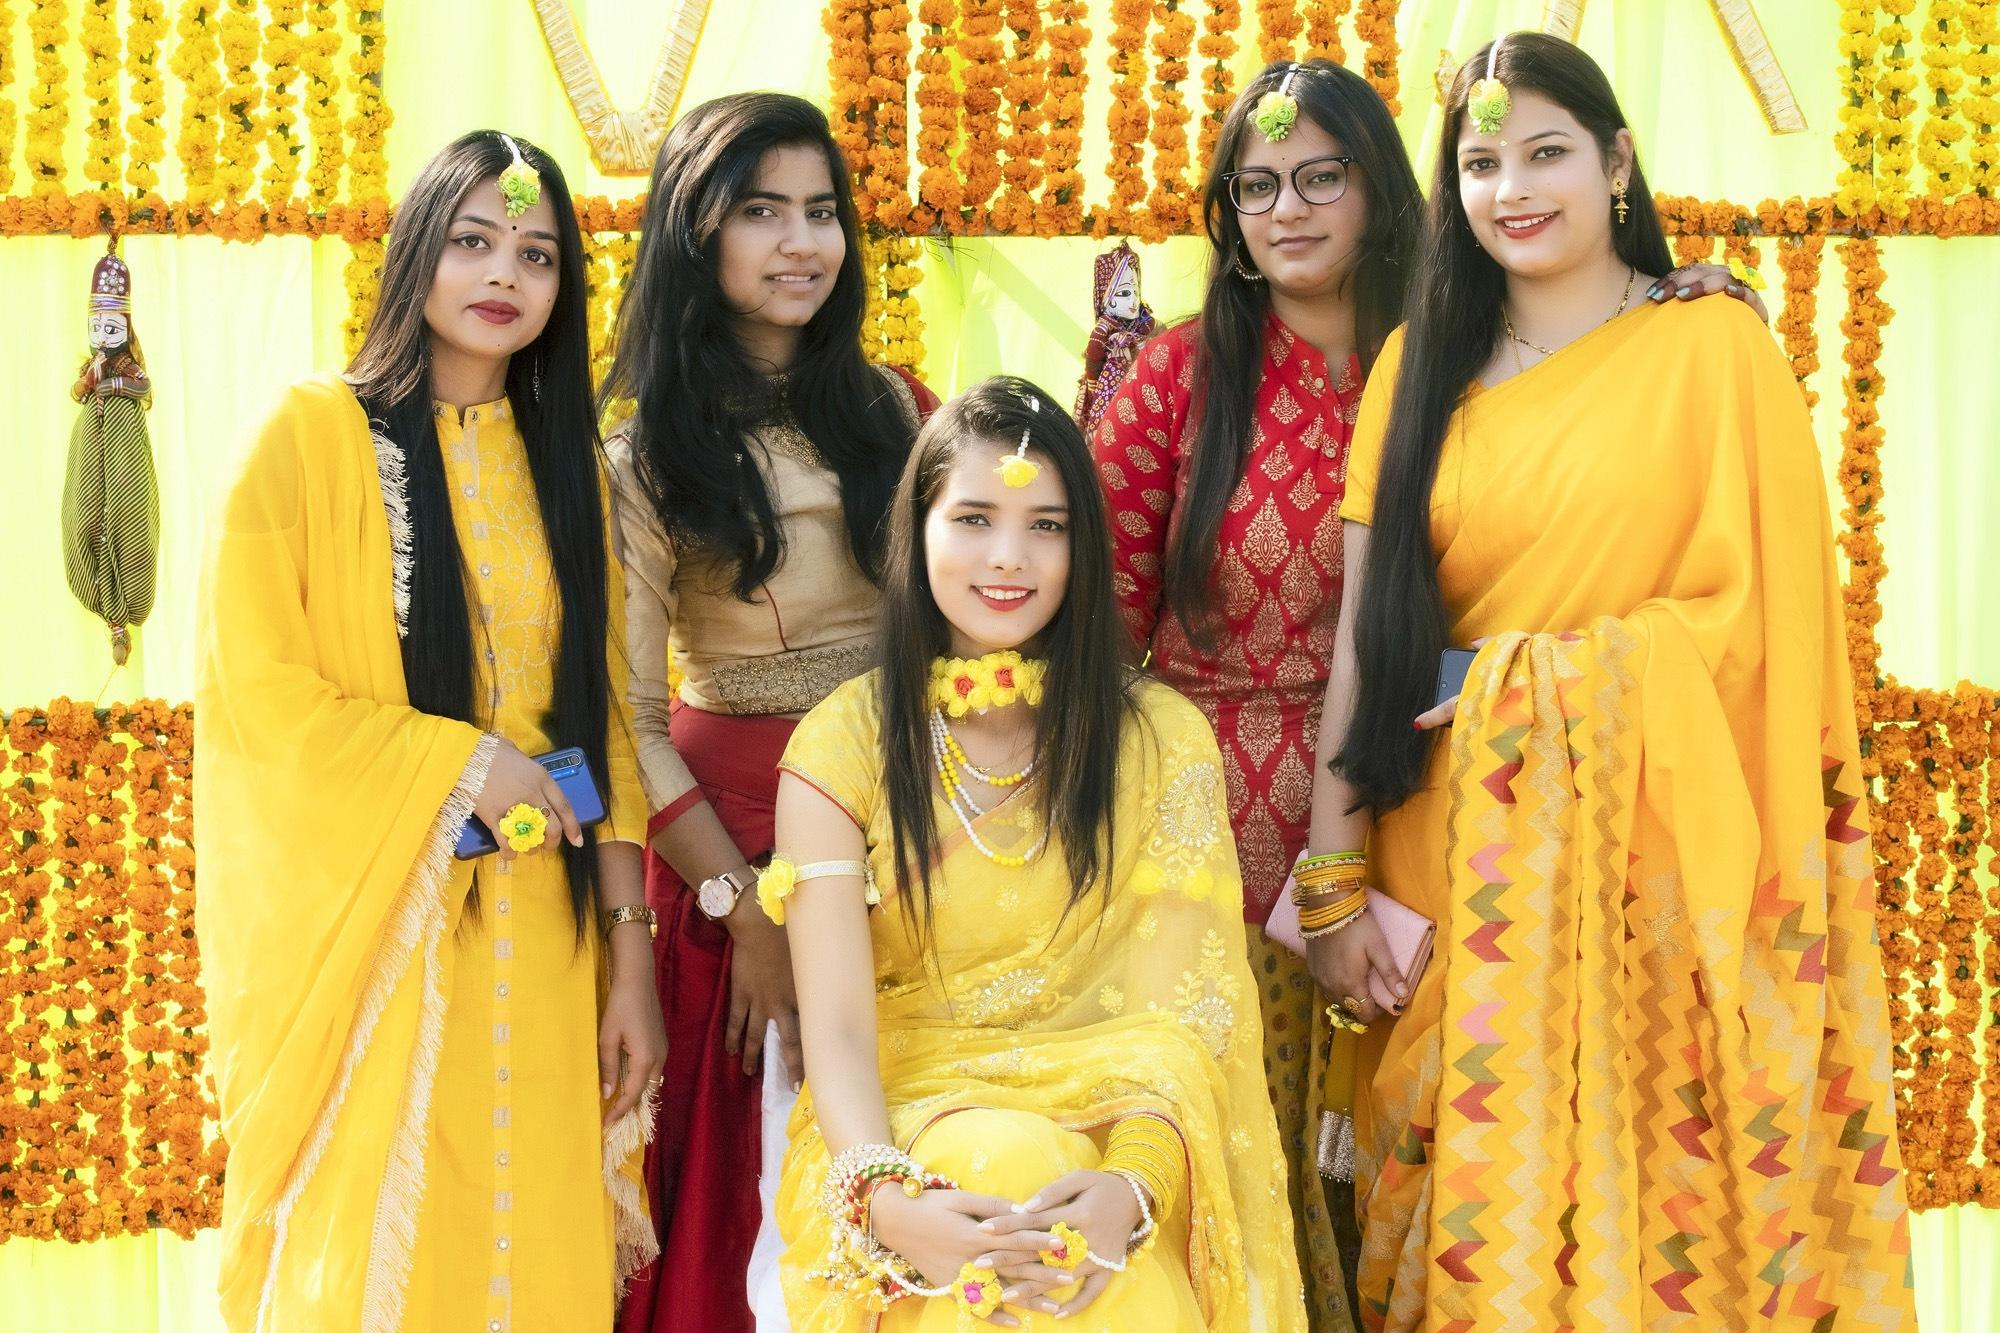 Haldi ceremony photography